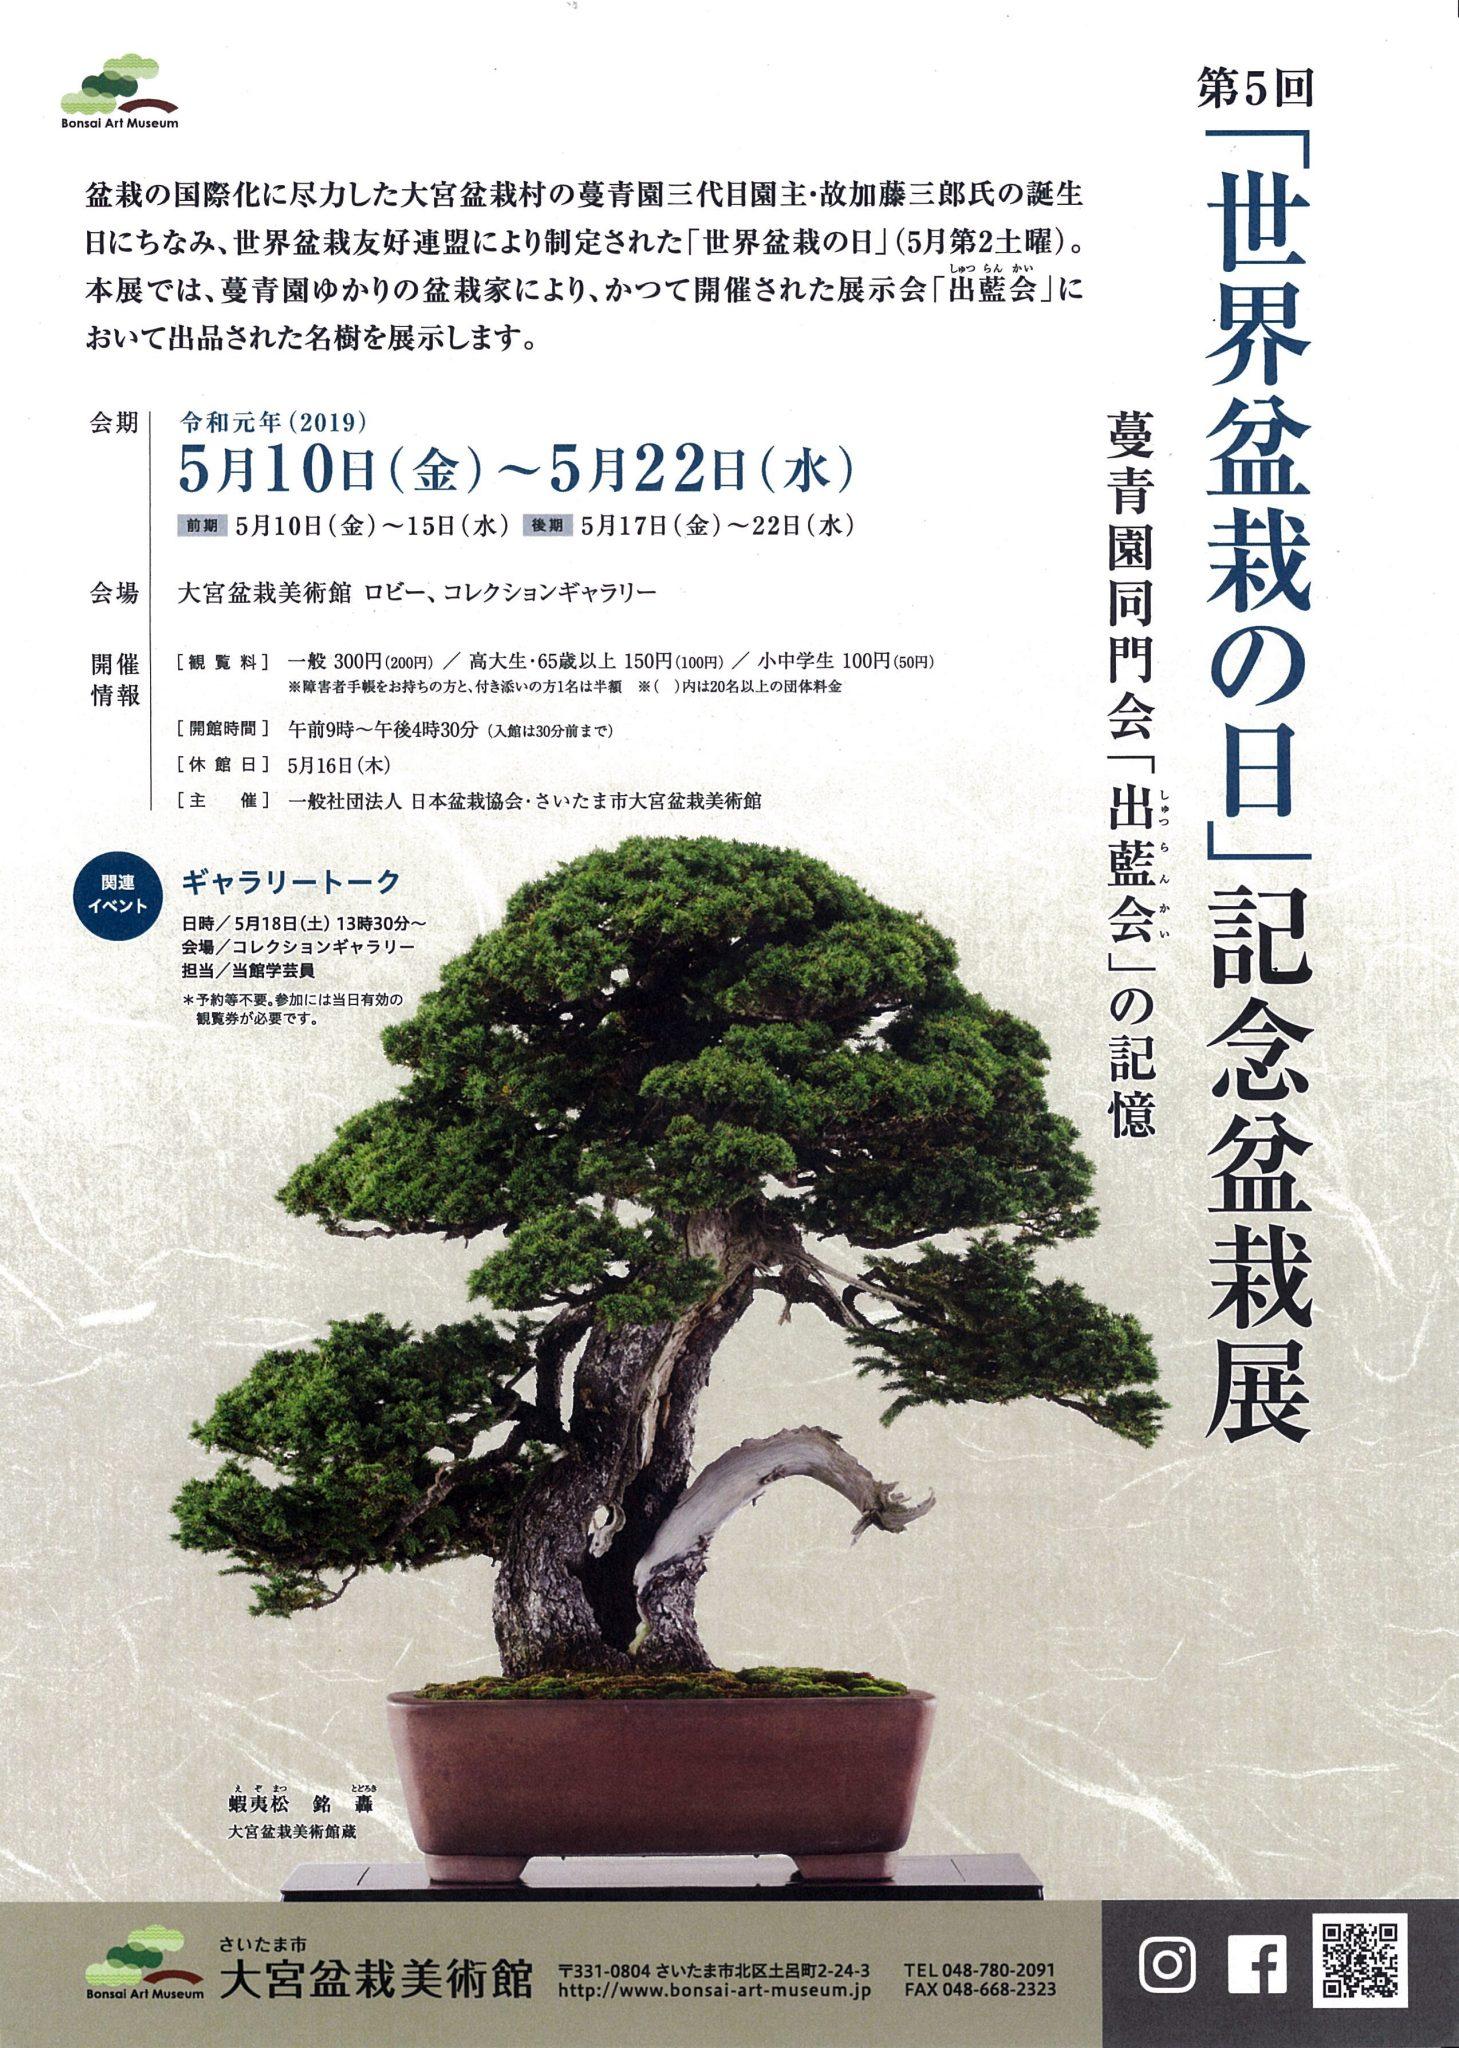 企画展 第5回「世界盆栽の日」記念盆栽展